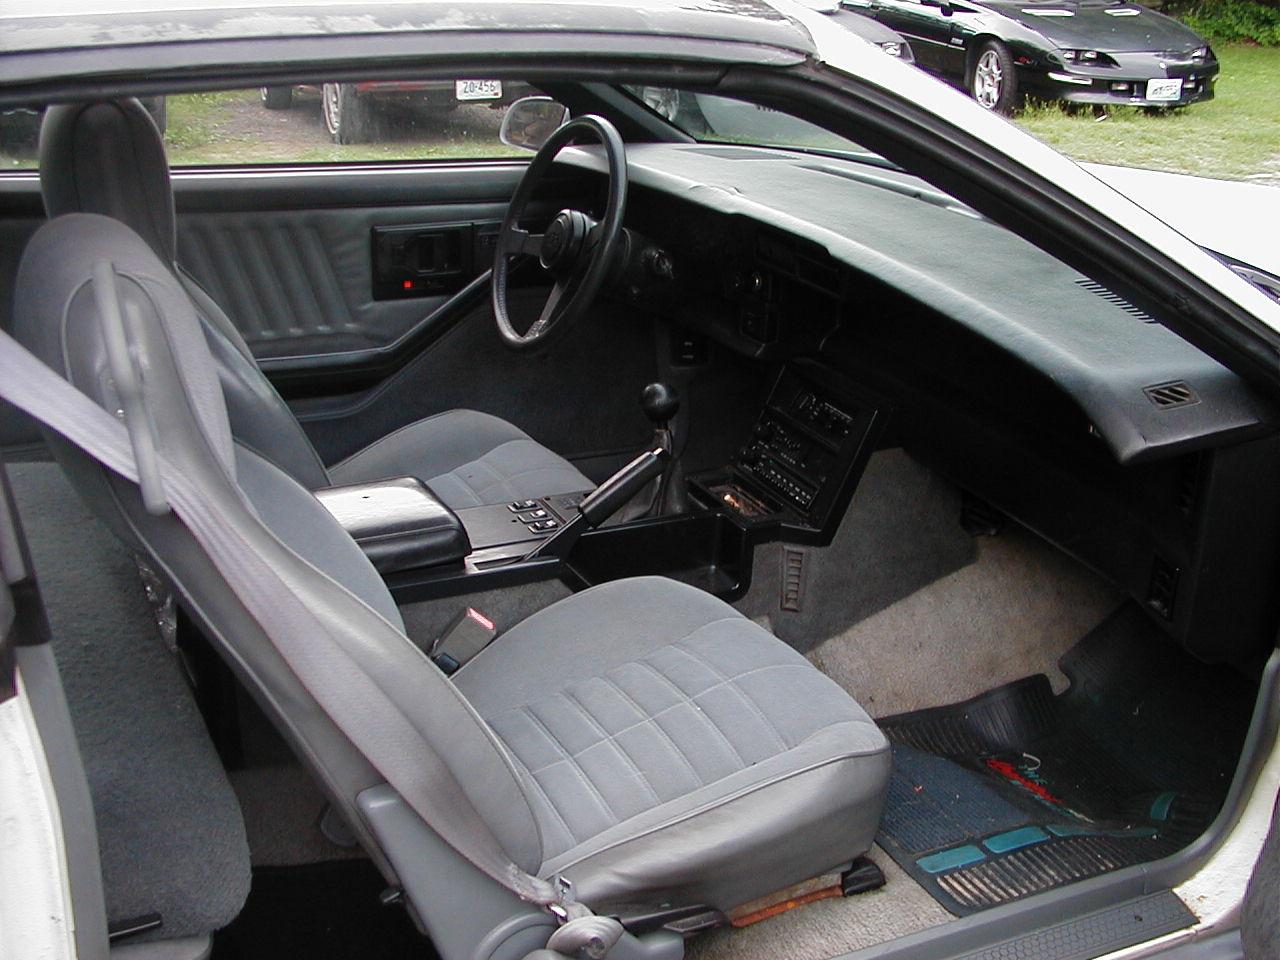 john in ri white 1987 camaro sports coupe